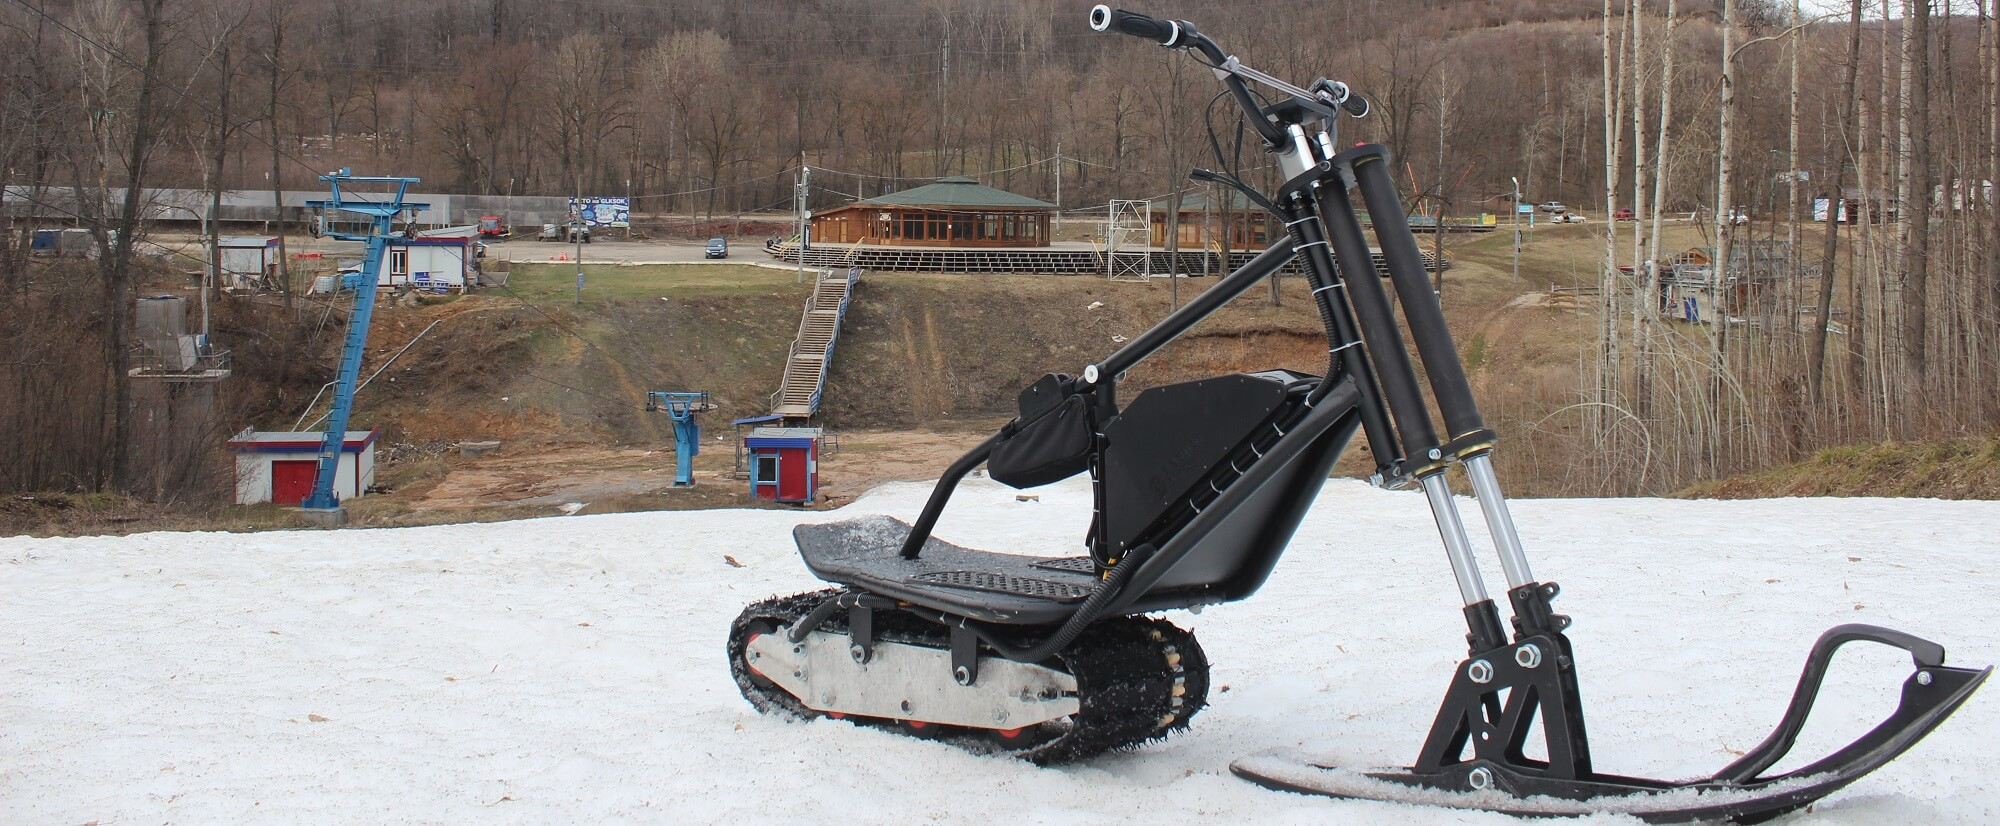 Elecrtric-snowbike_slider_13